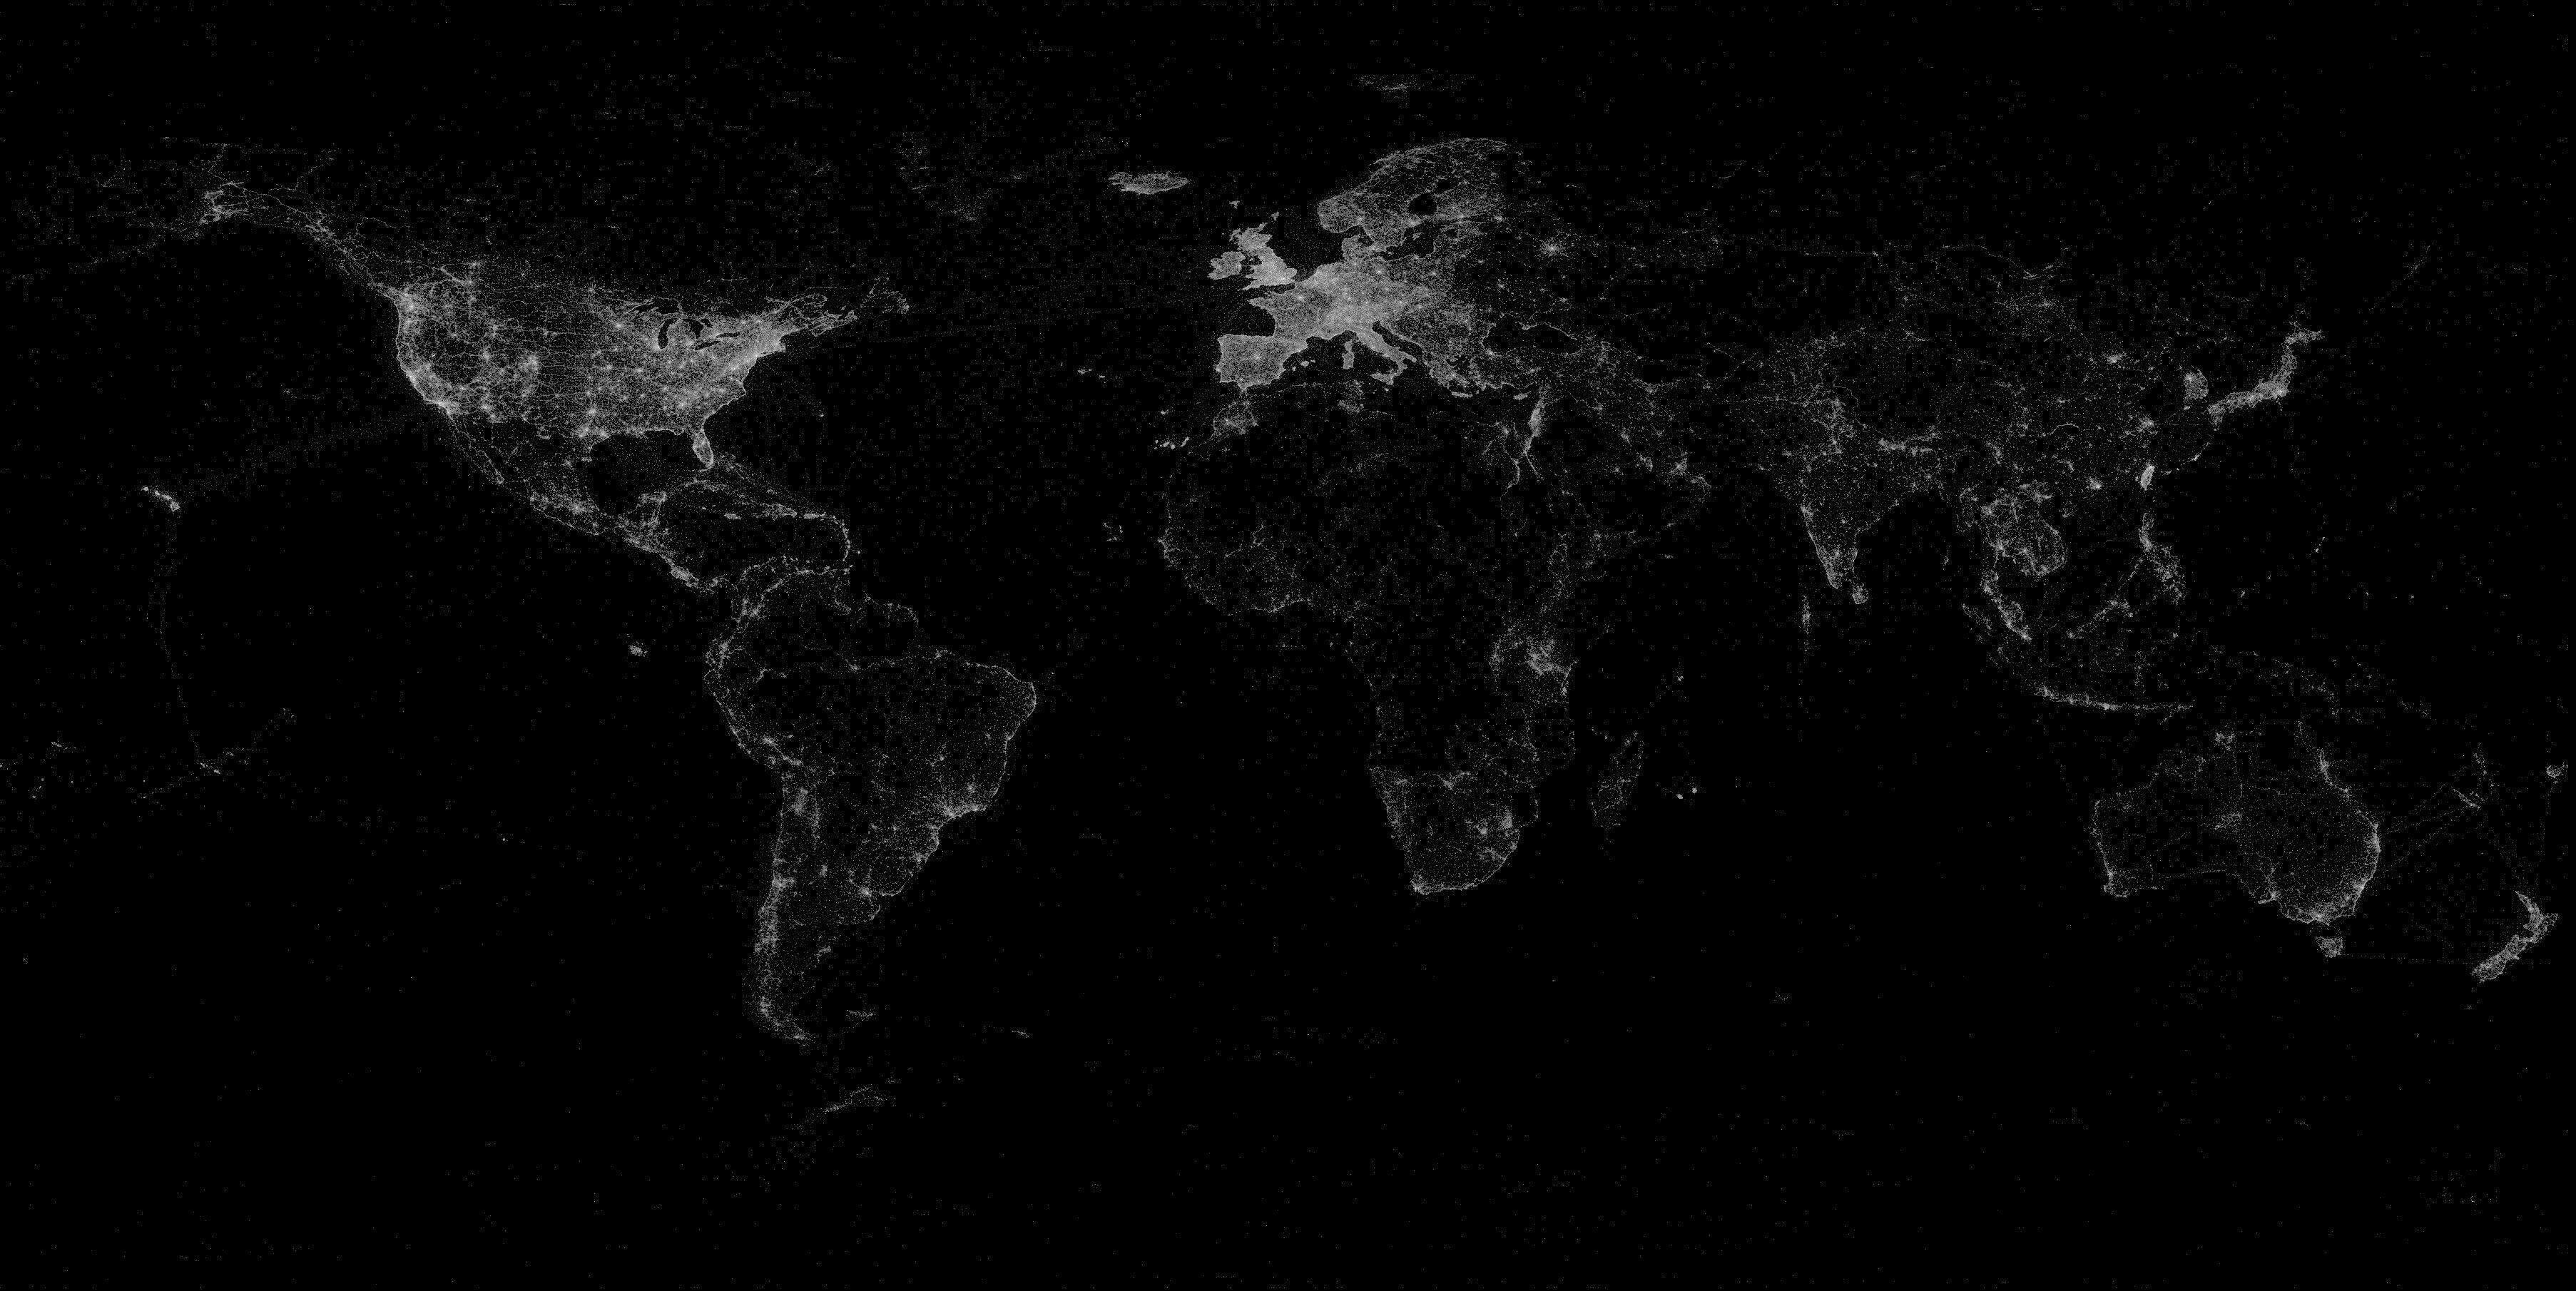 Hình nền World of Darkness 3611x1810